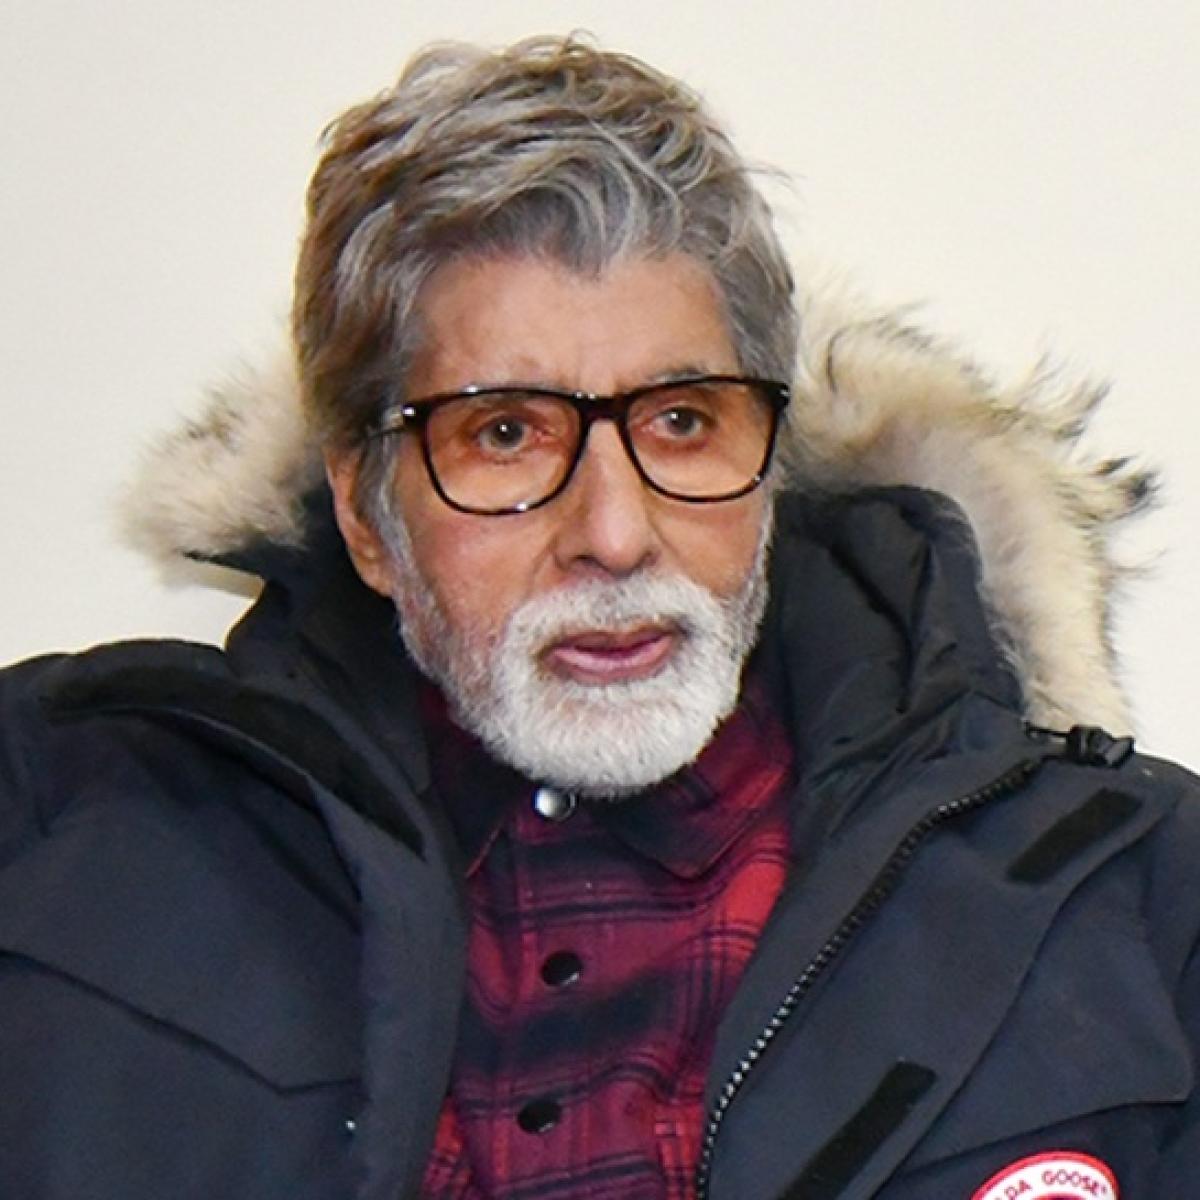 Throwback Thursday: 'When rape is inevitable, lie back and enjoy it!' - Amitabh Bachchan